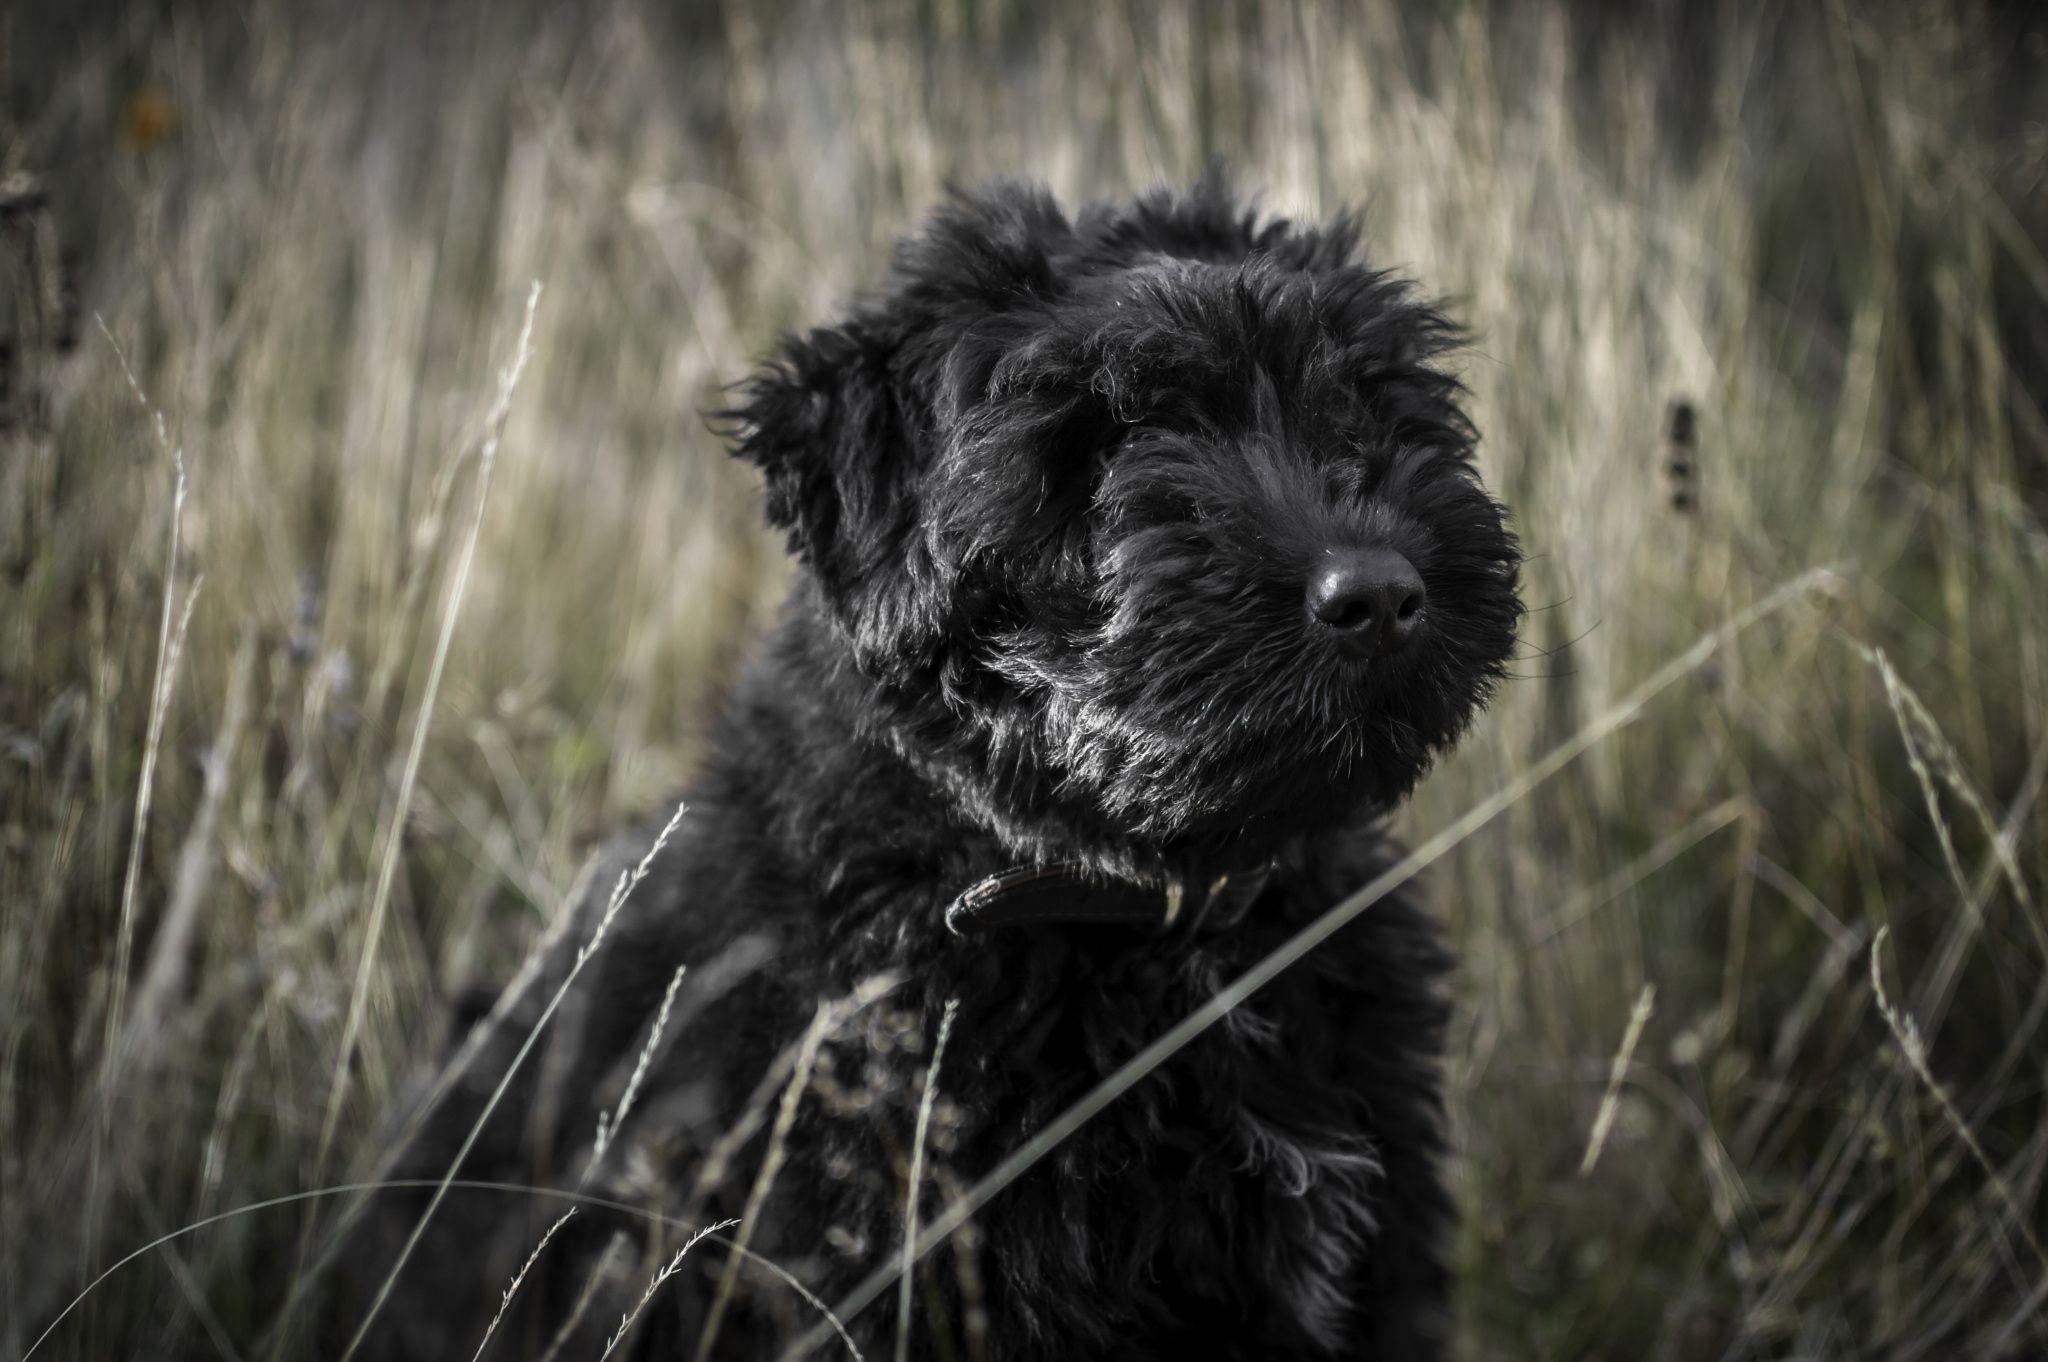 Bouvier puppy bouviers des flandres puppies flanders